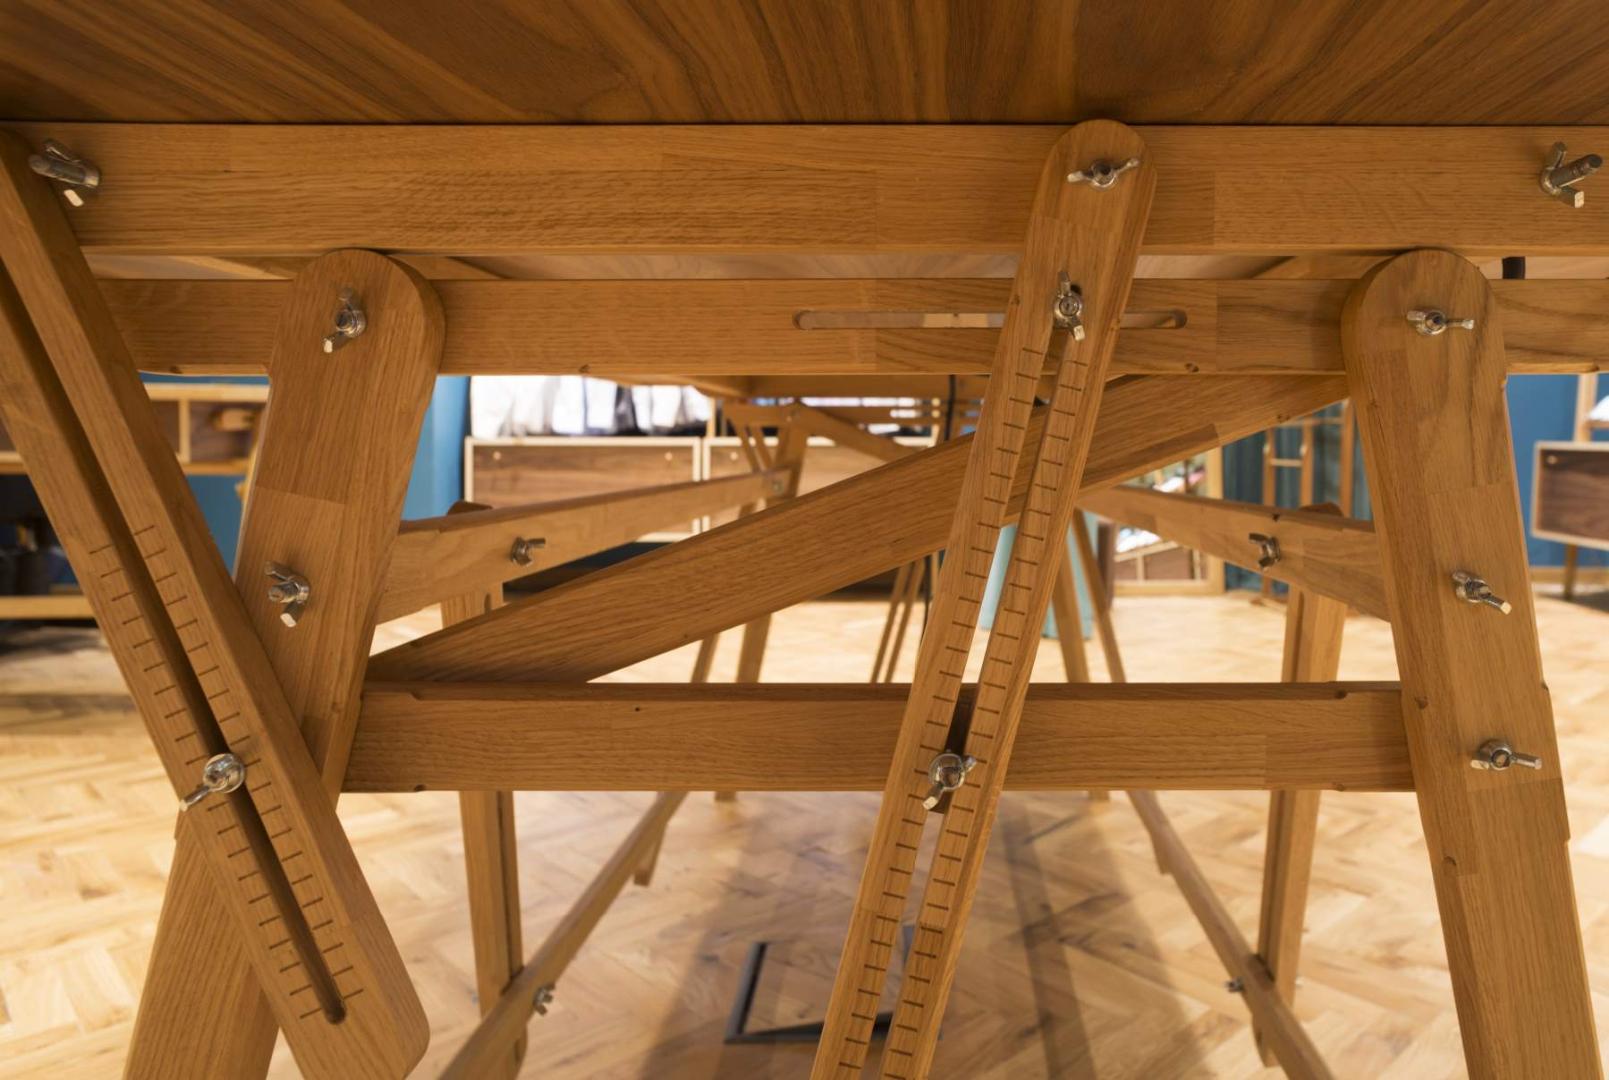 Braiconf magazin shop marriott mobilier lemn masiv furnir design dinamic020